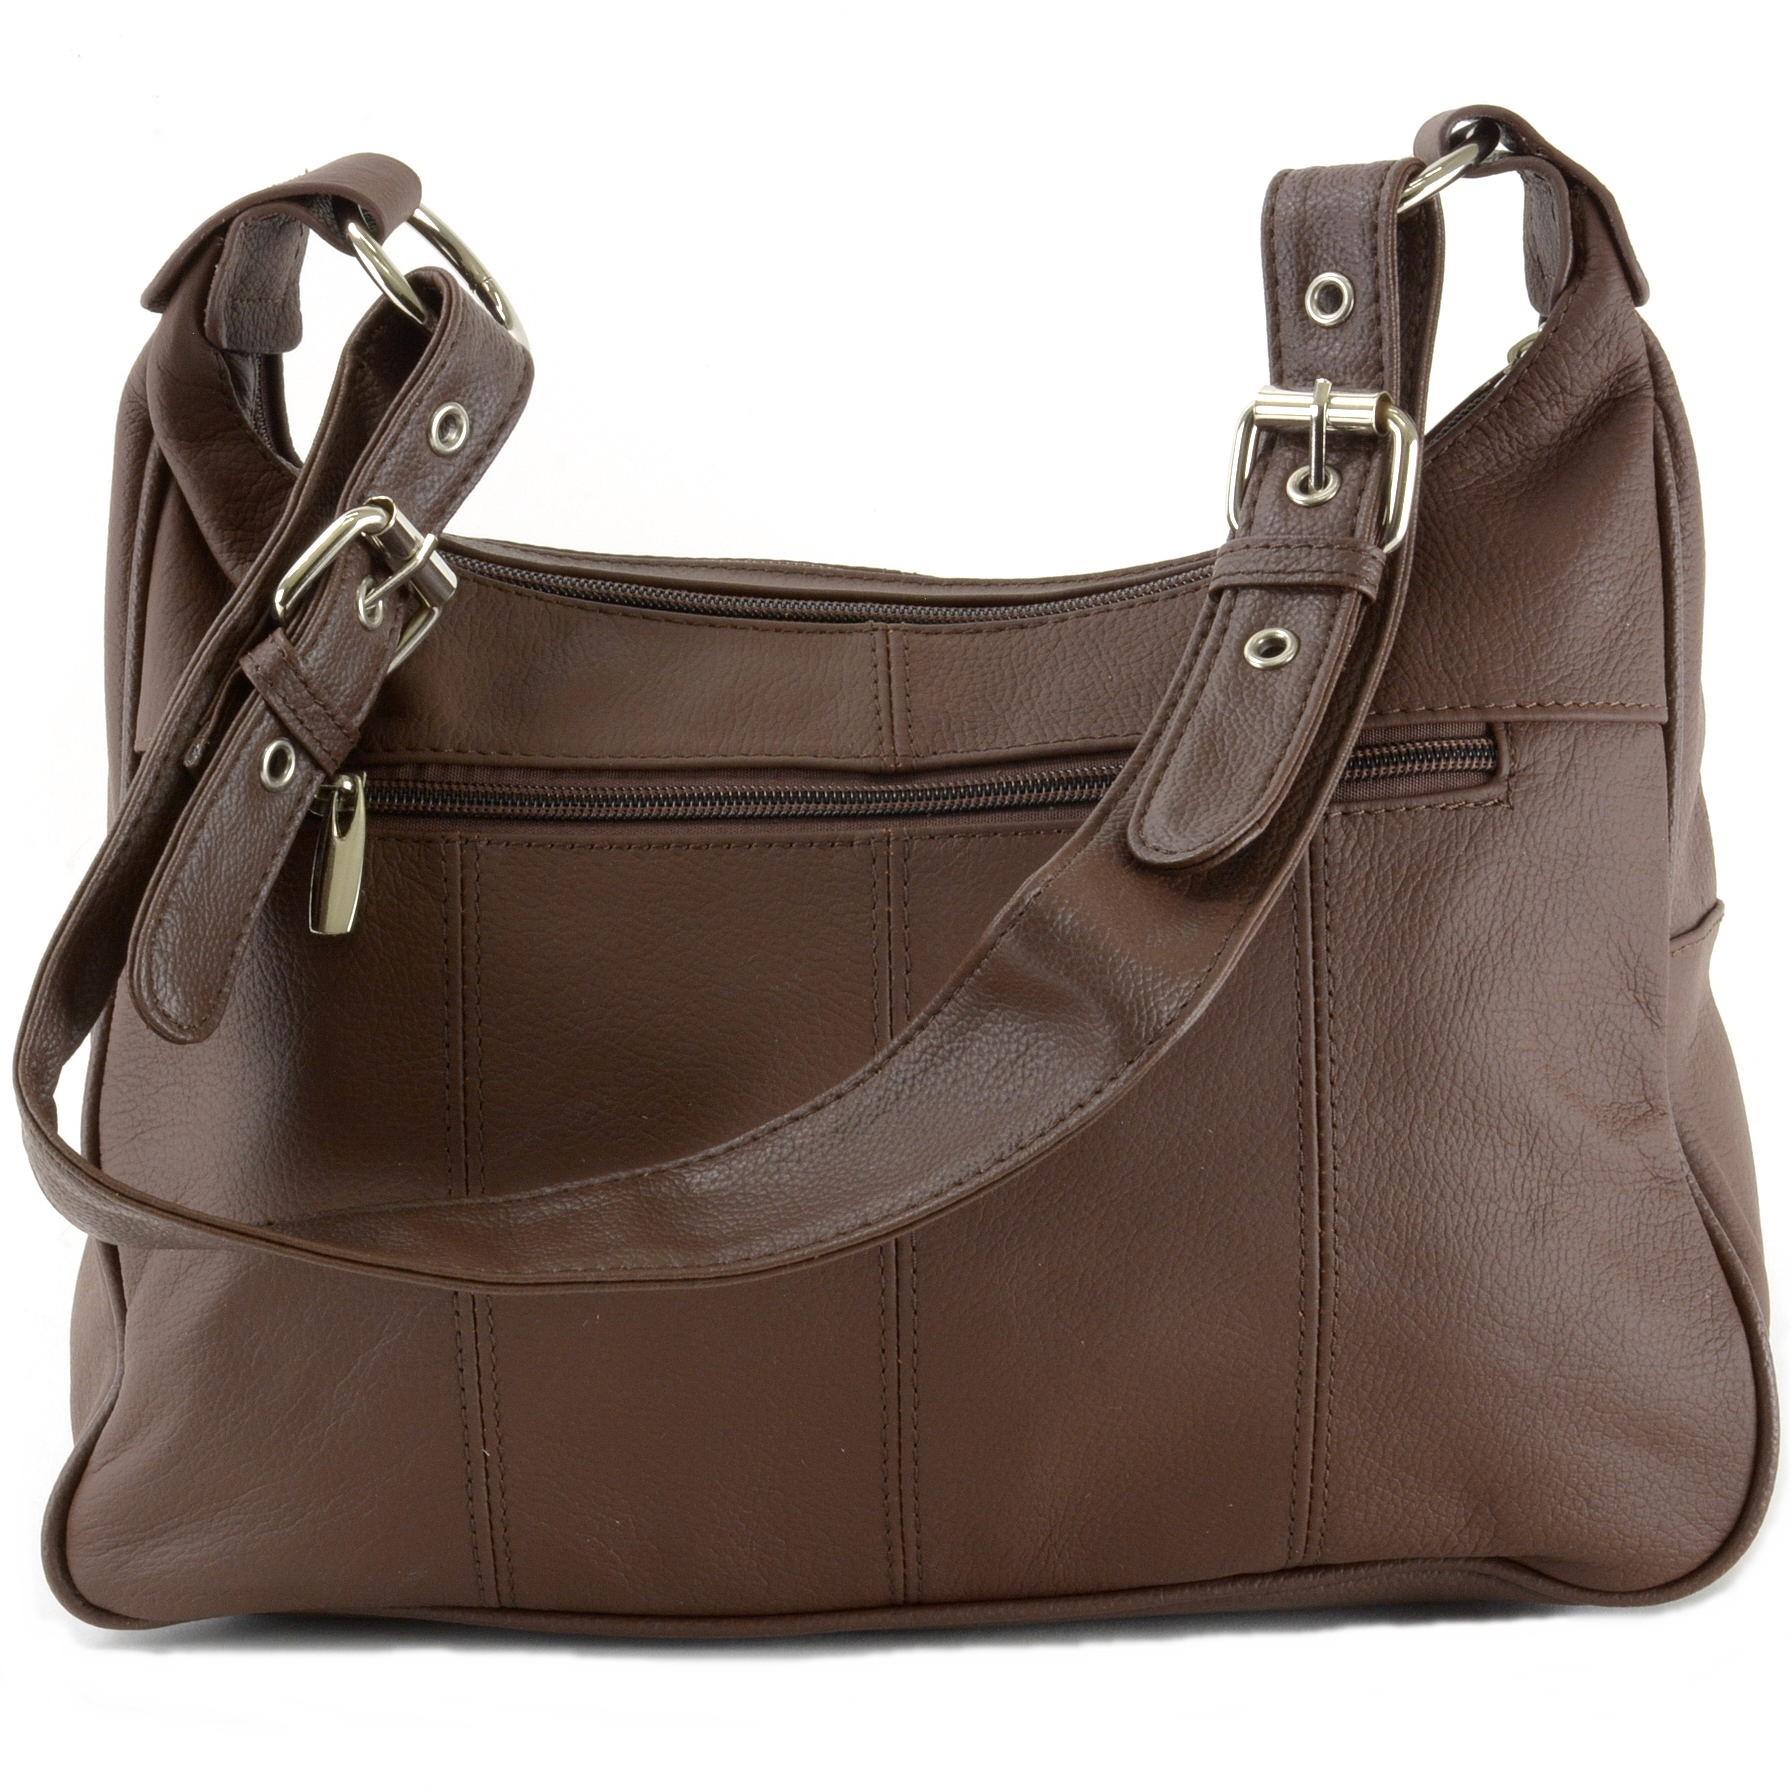 New Women Lady Leather Satchel Handbag Shoulder Tote Messenger Crossbody Bag | EBay